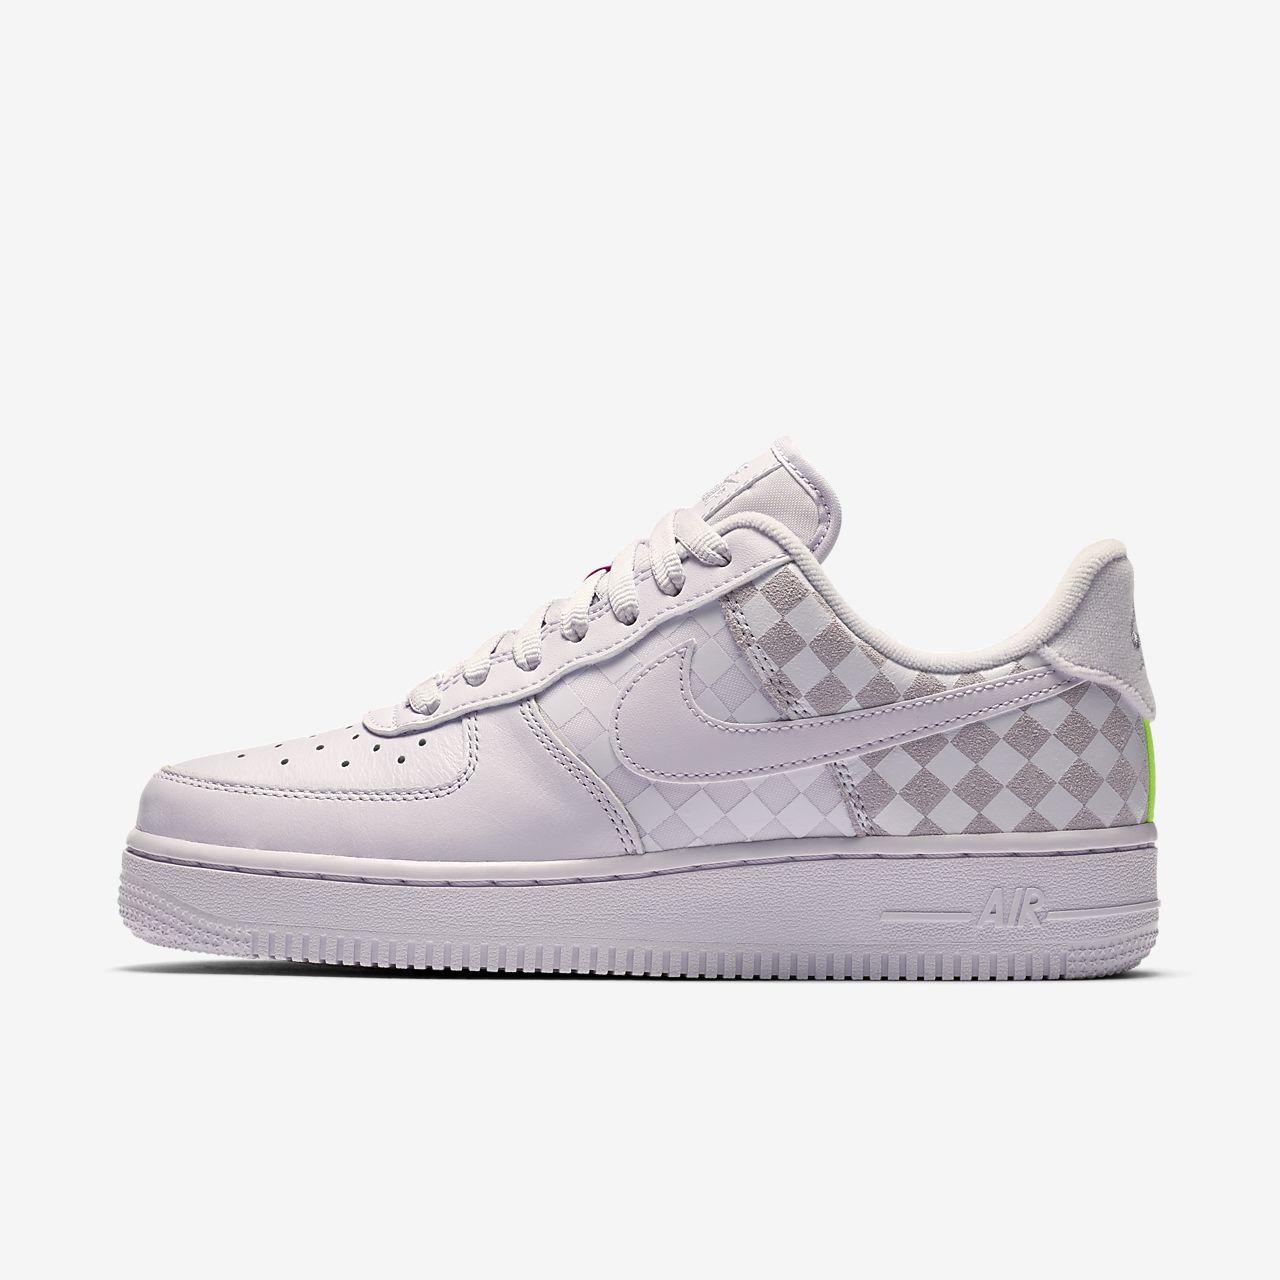 Chaussure à damiers Nike Air Force 1 Low pour Femme